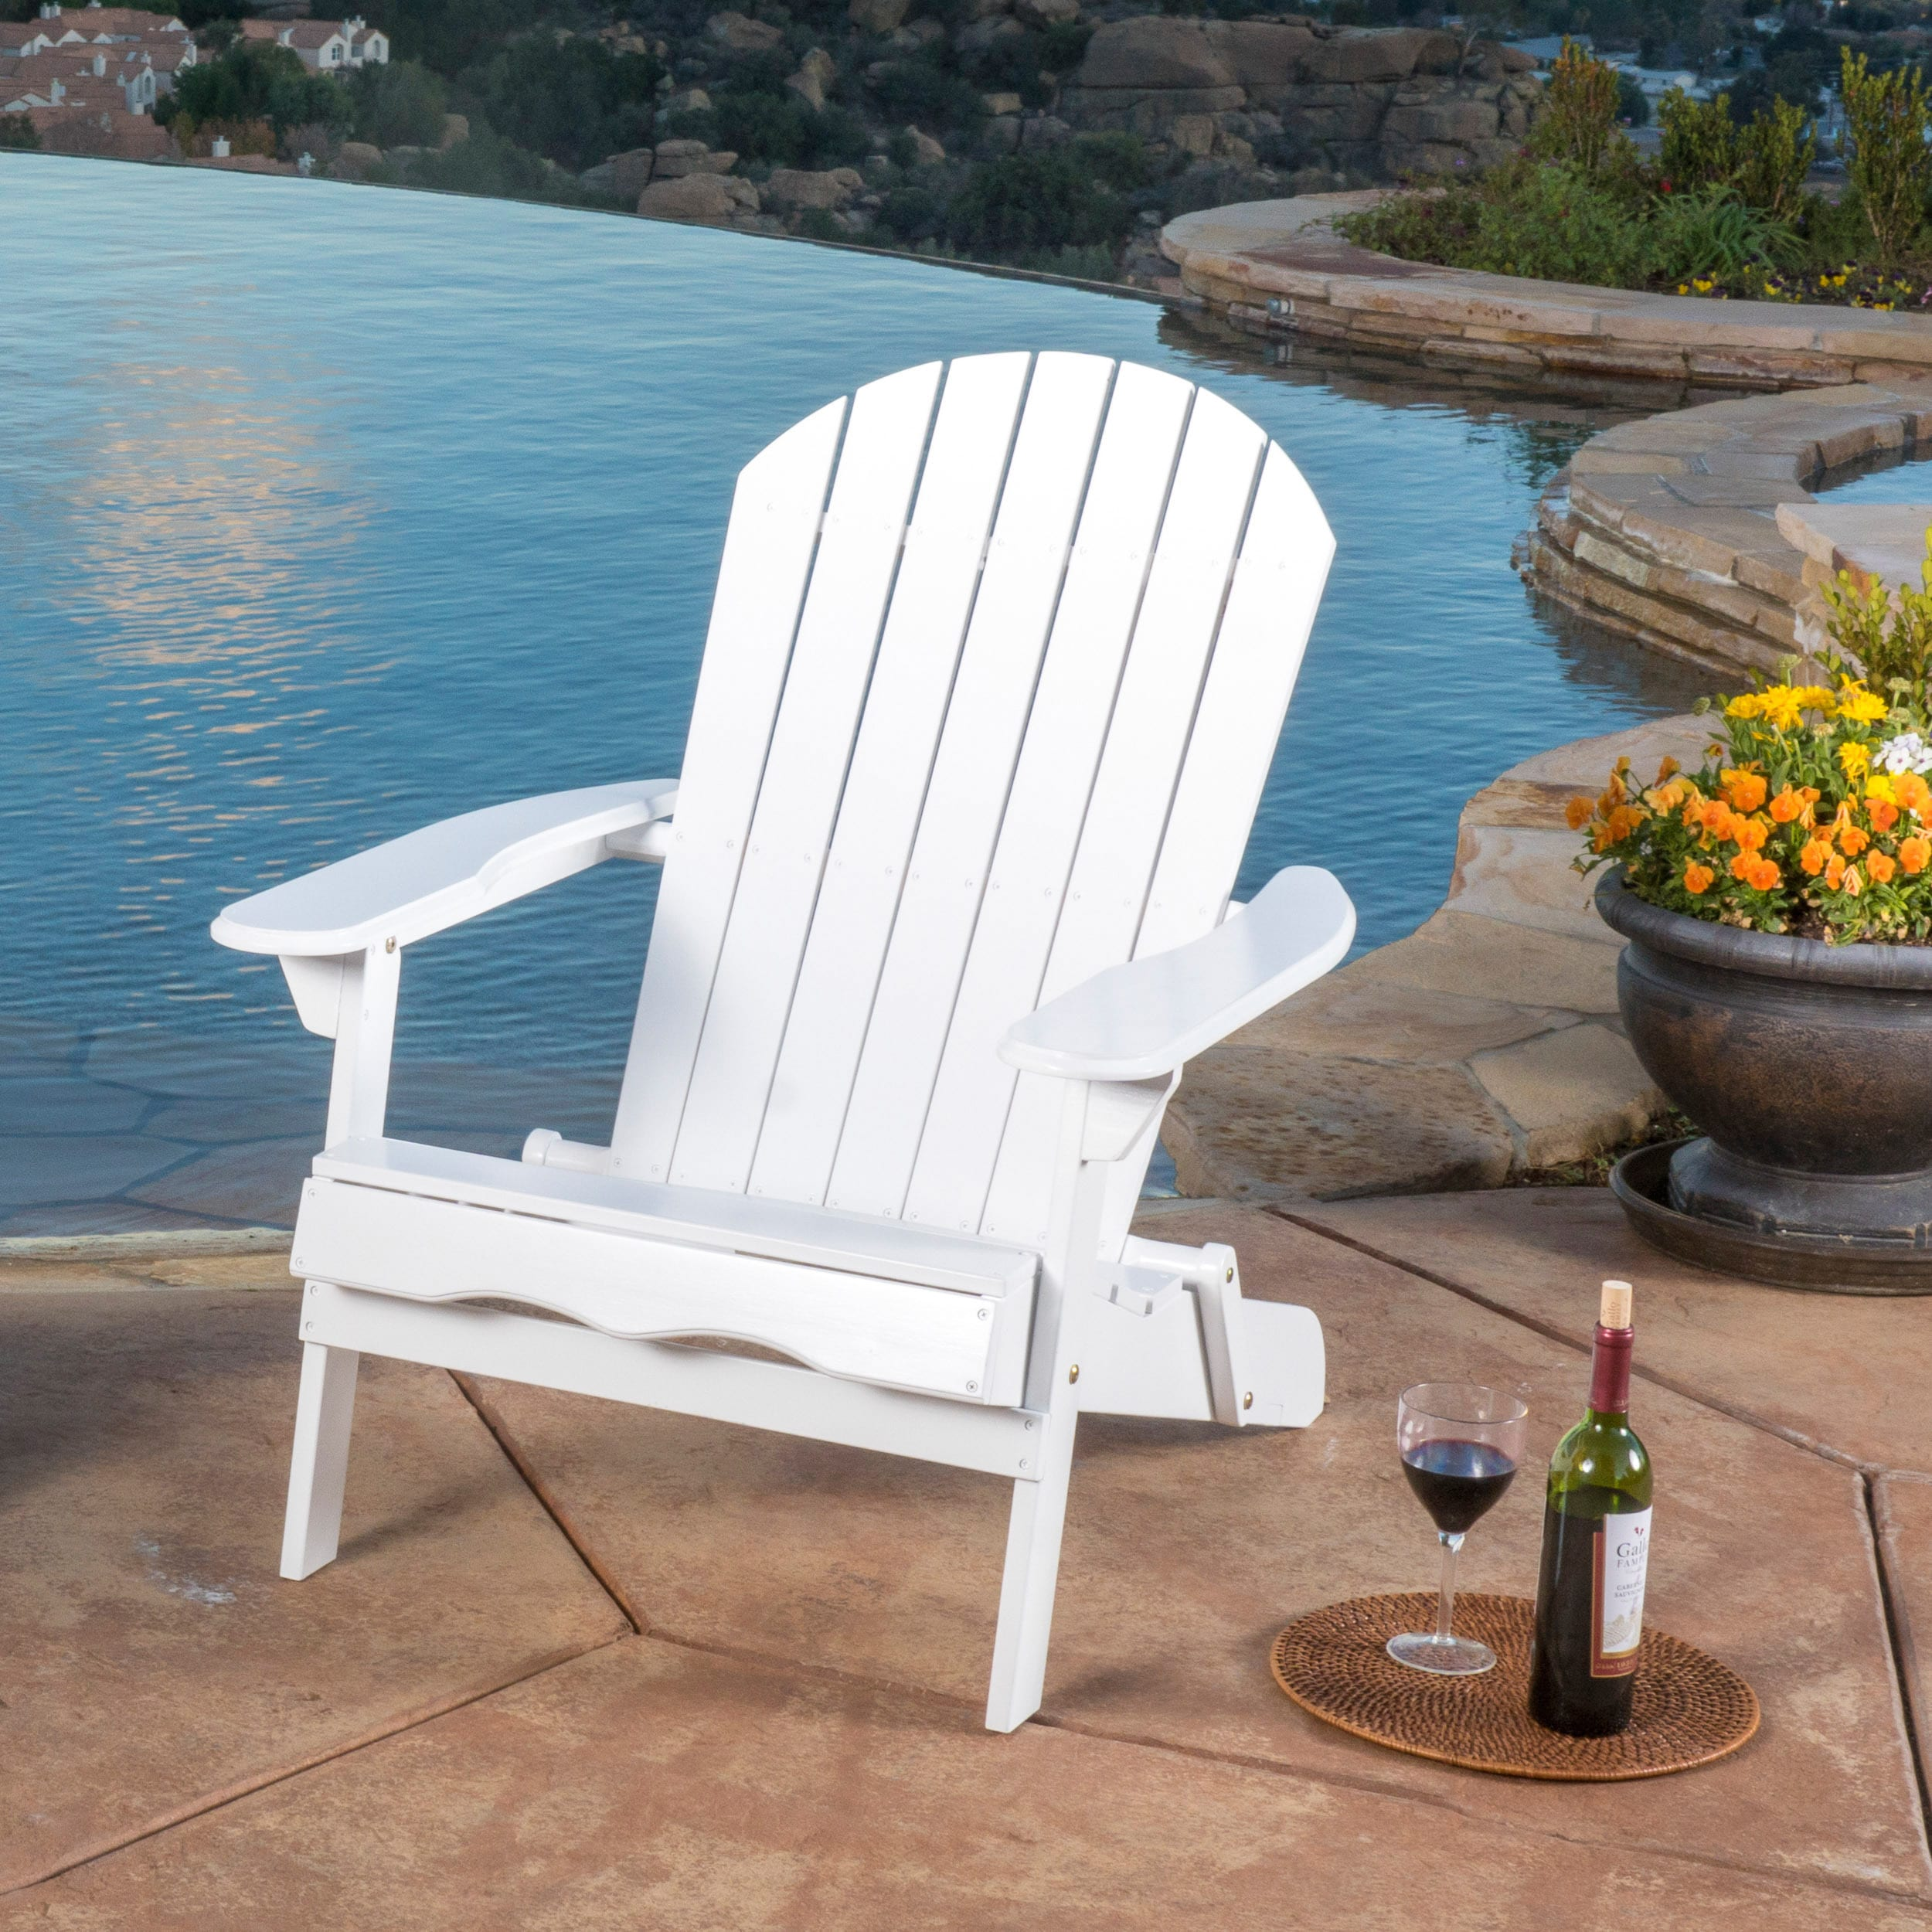 Hanlee Outdoor Rustic Acacia Wood Folding Adirondack Chair